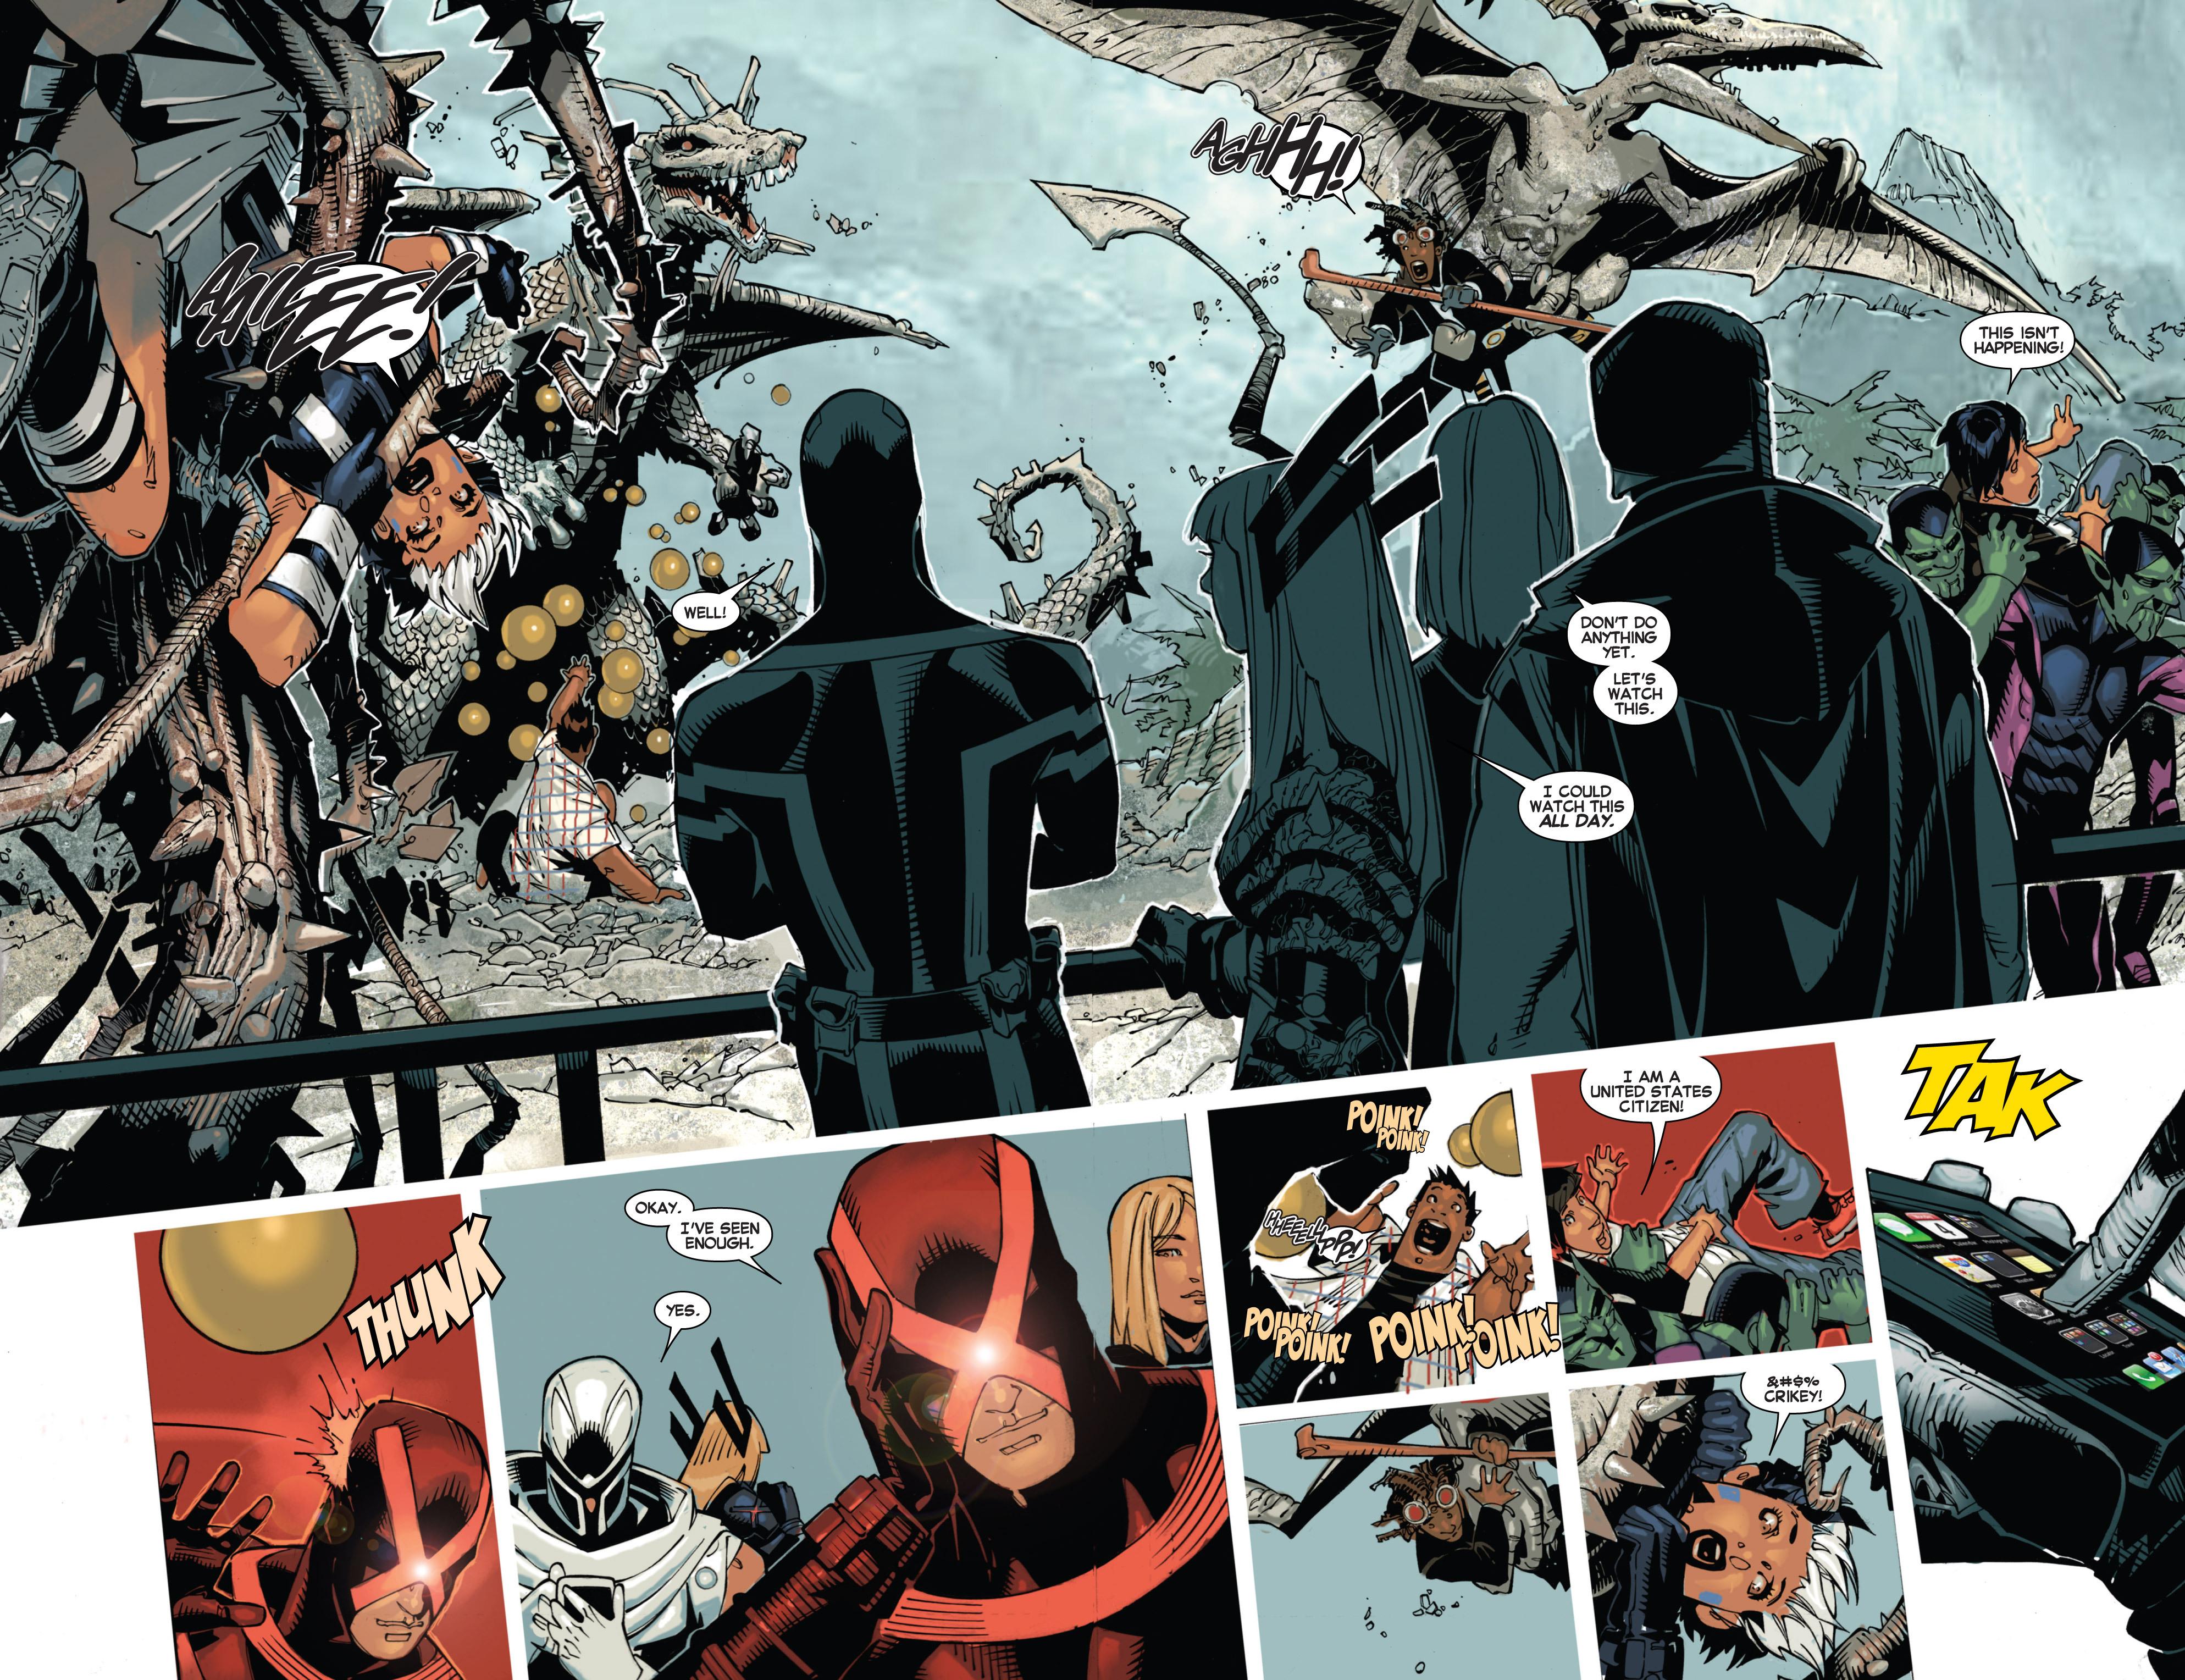 Read online Uncanny X-Men (2013) comic -  Issue # _TPB 1 - Revolution - 77